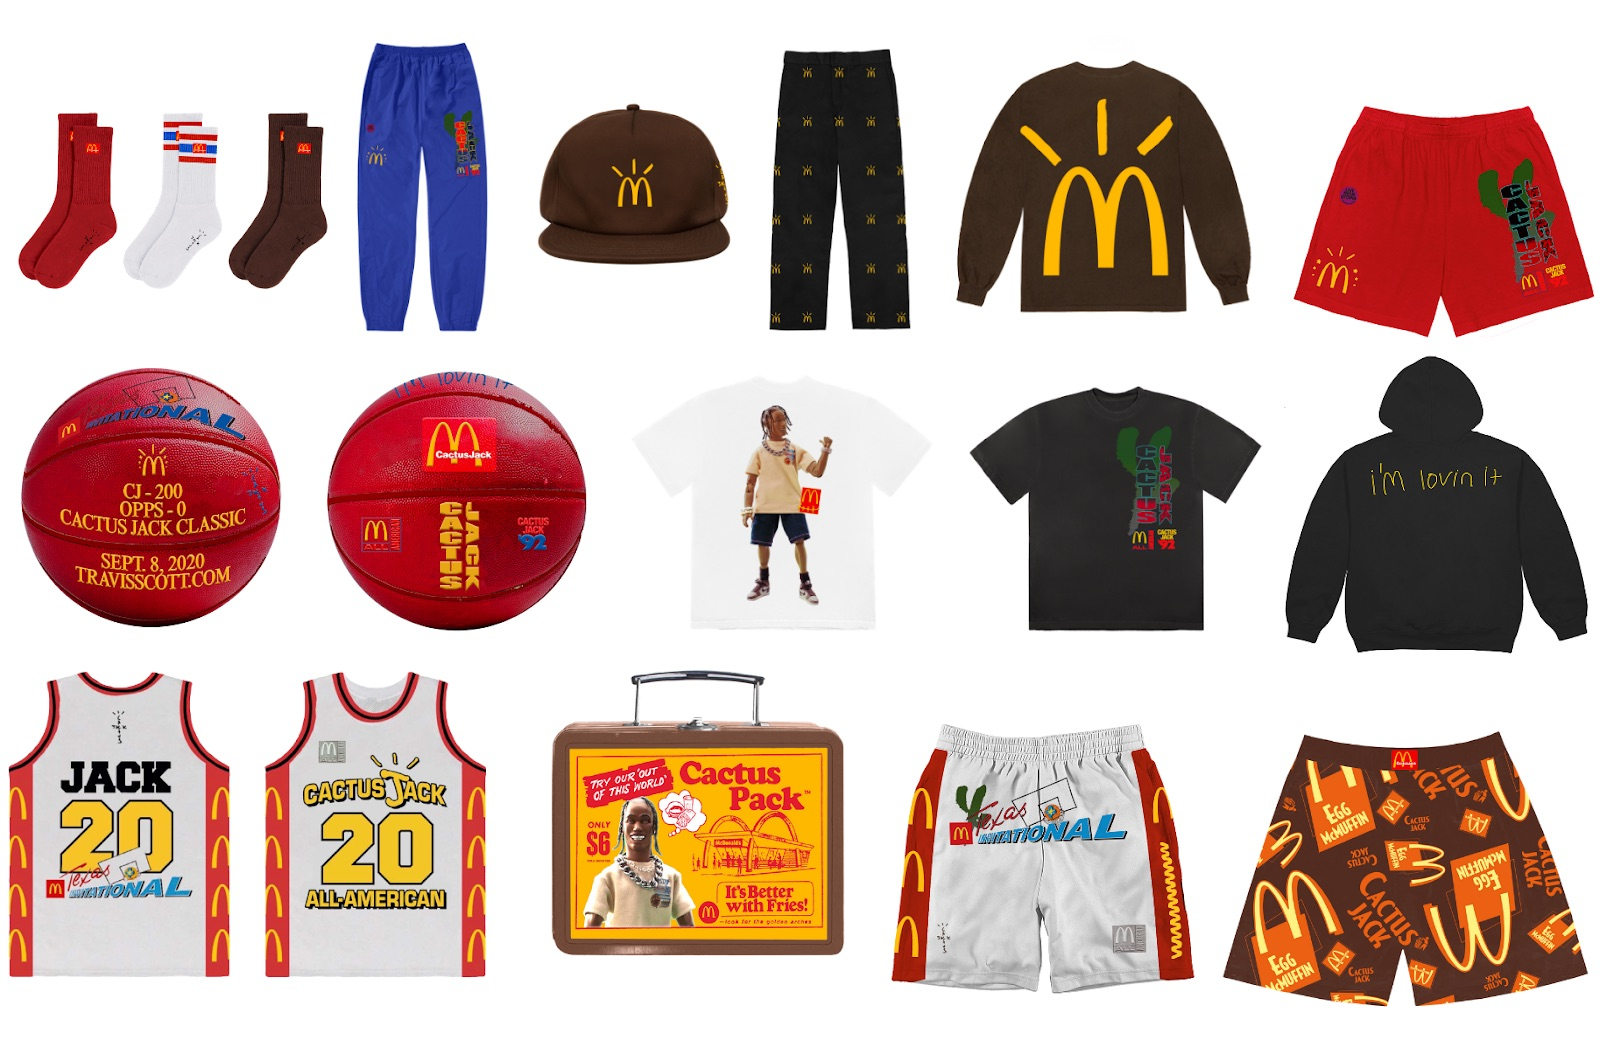 Travis Scott and McDonald's merch offerings